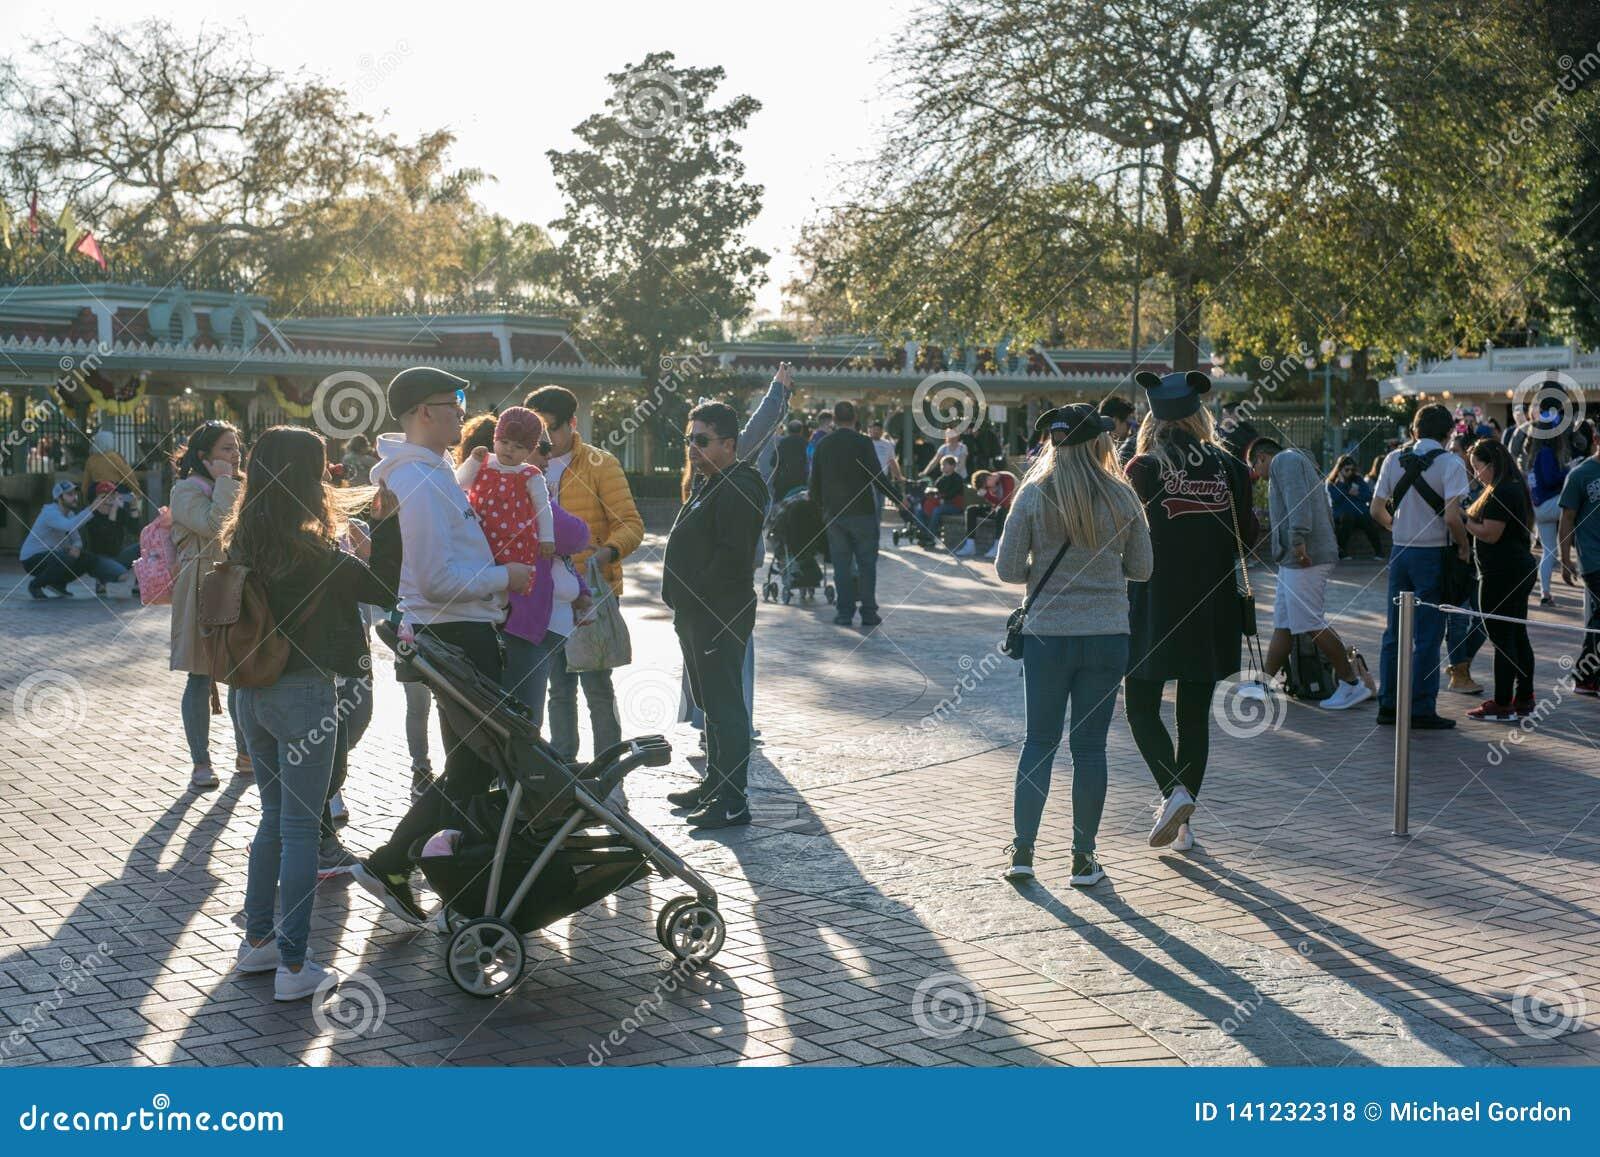 Disneyland Resort Theme Park in Anaheim, California